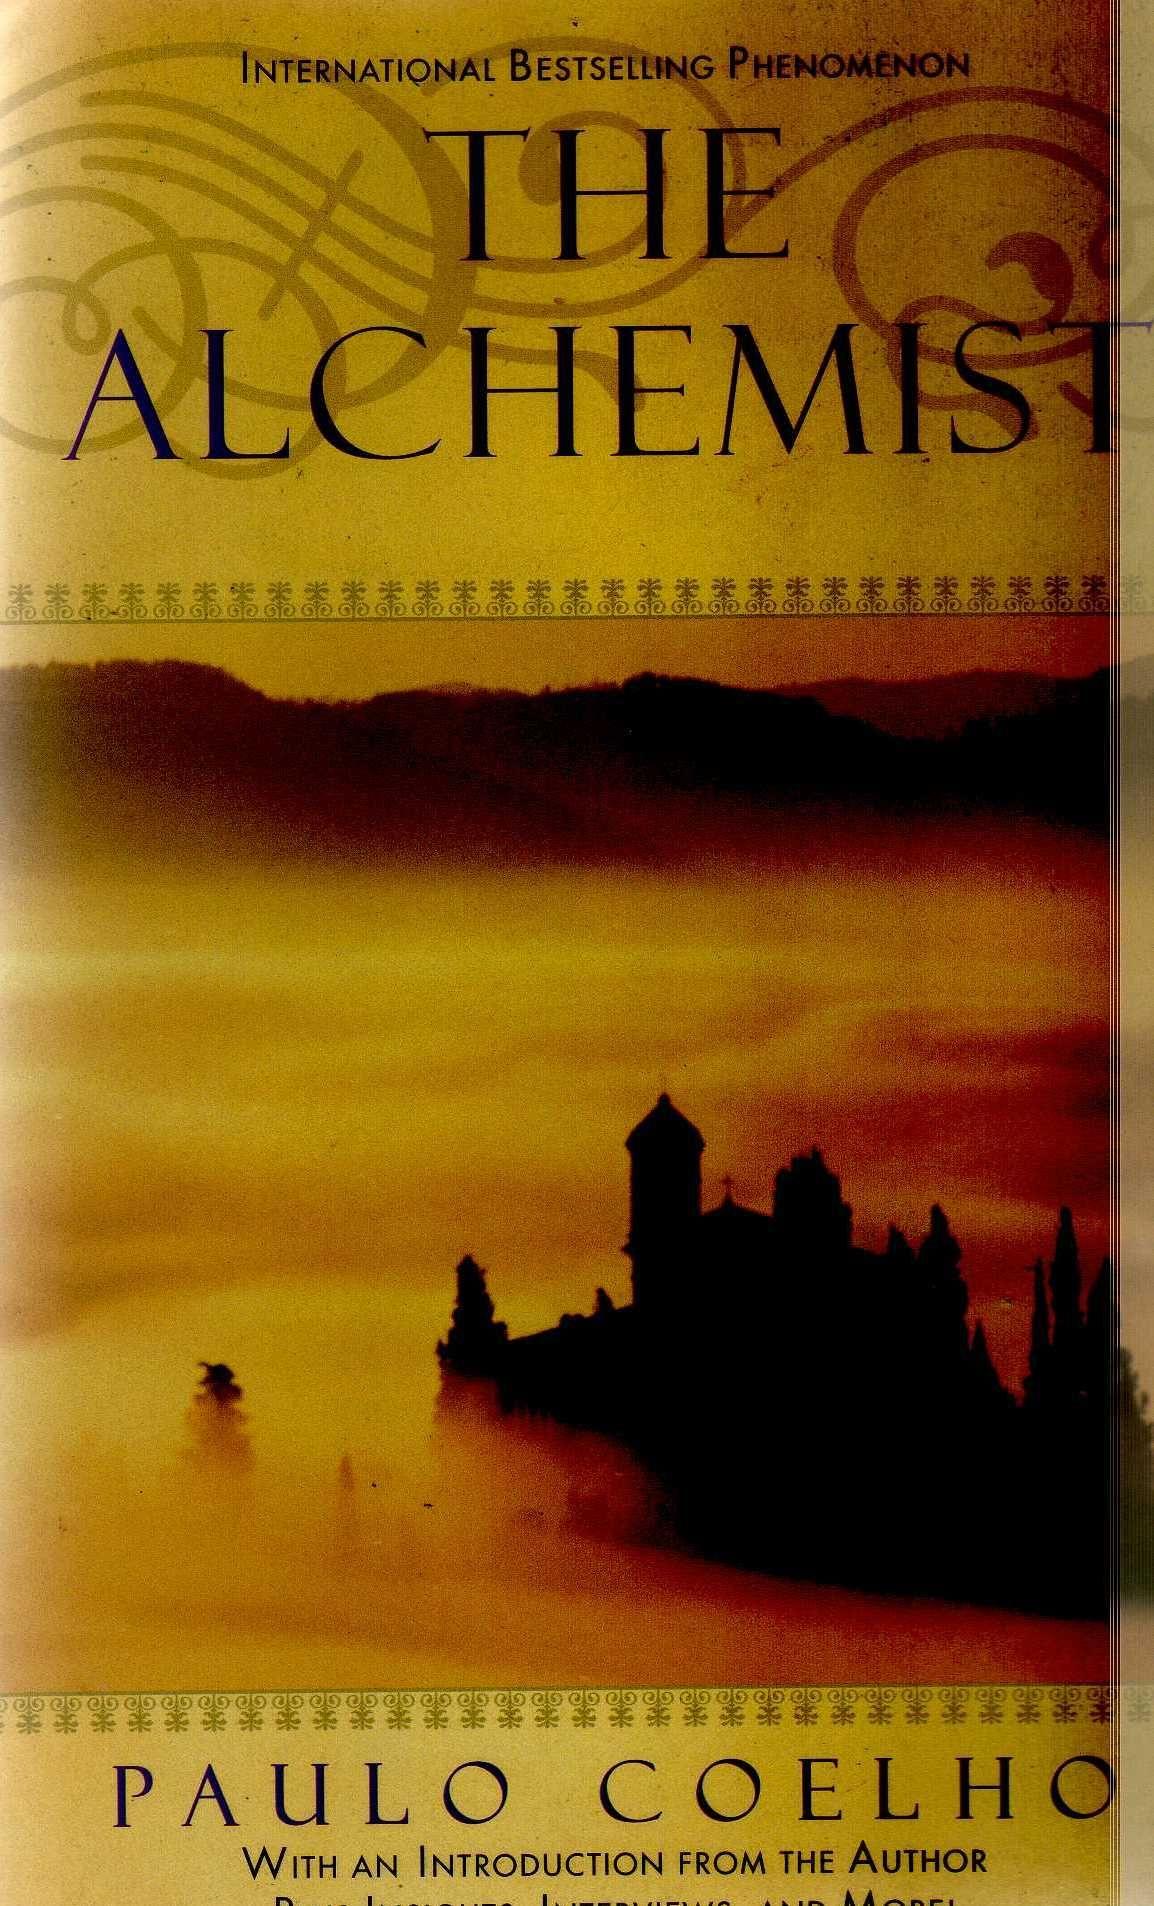 The Alchemist by Paulo Coelho Book worth reading, Author